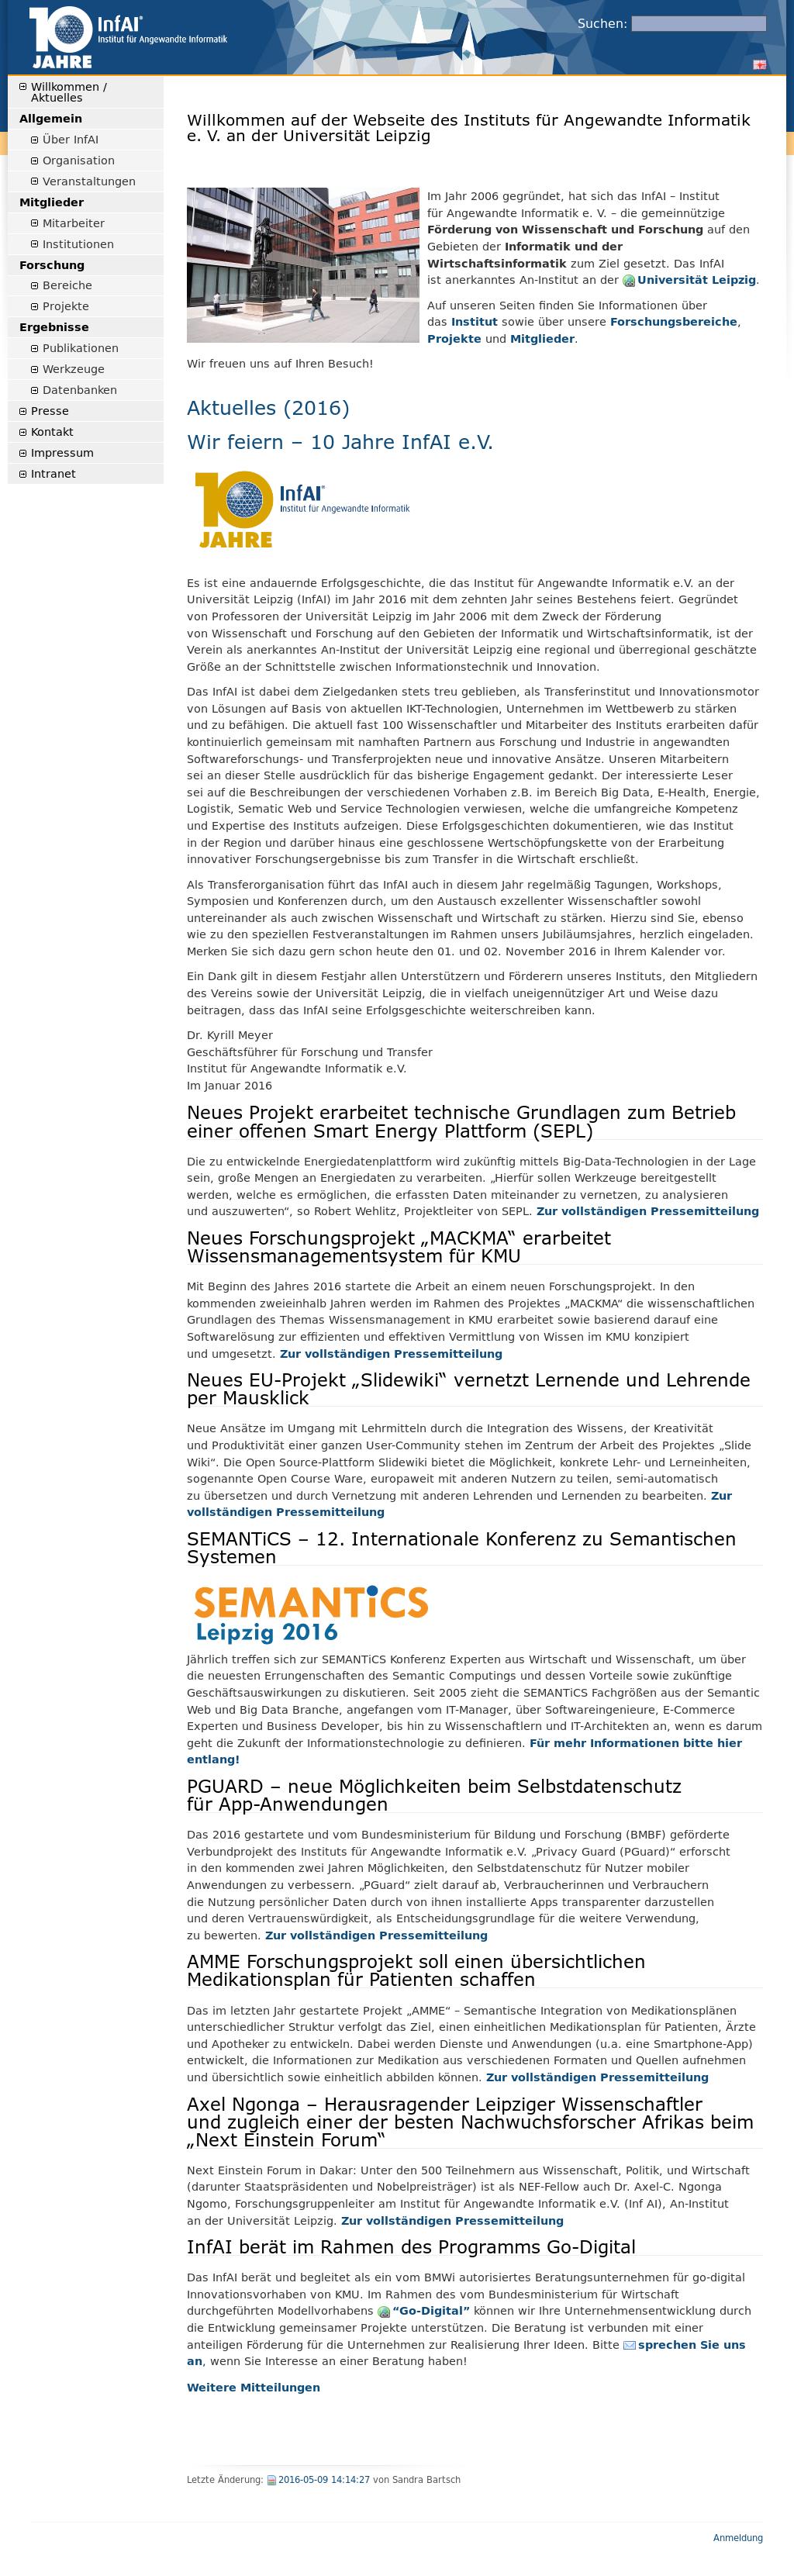 Beste Bester Kauf Digitaler Rahmen Bilder - Rahmen Ideen ...